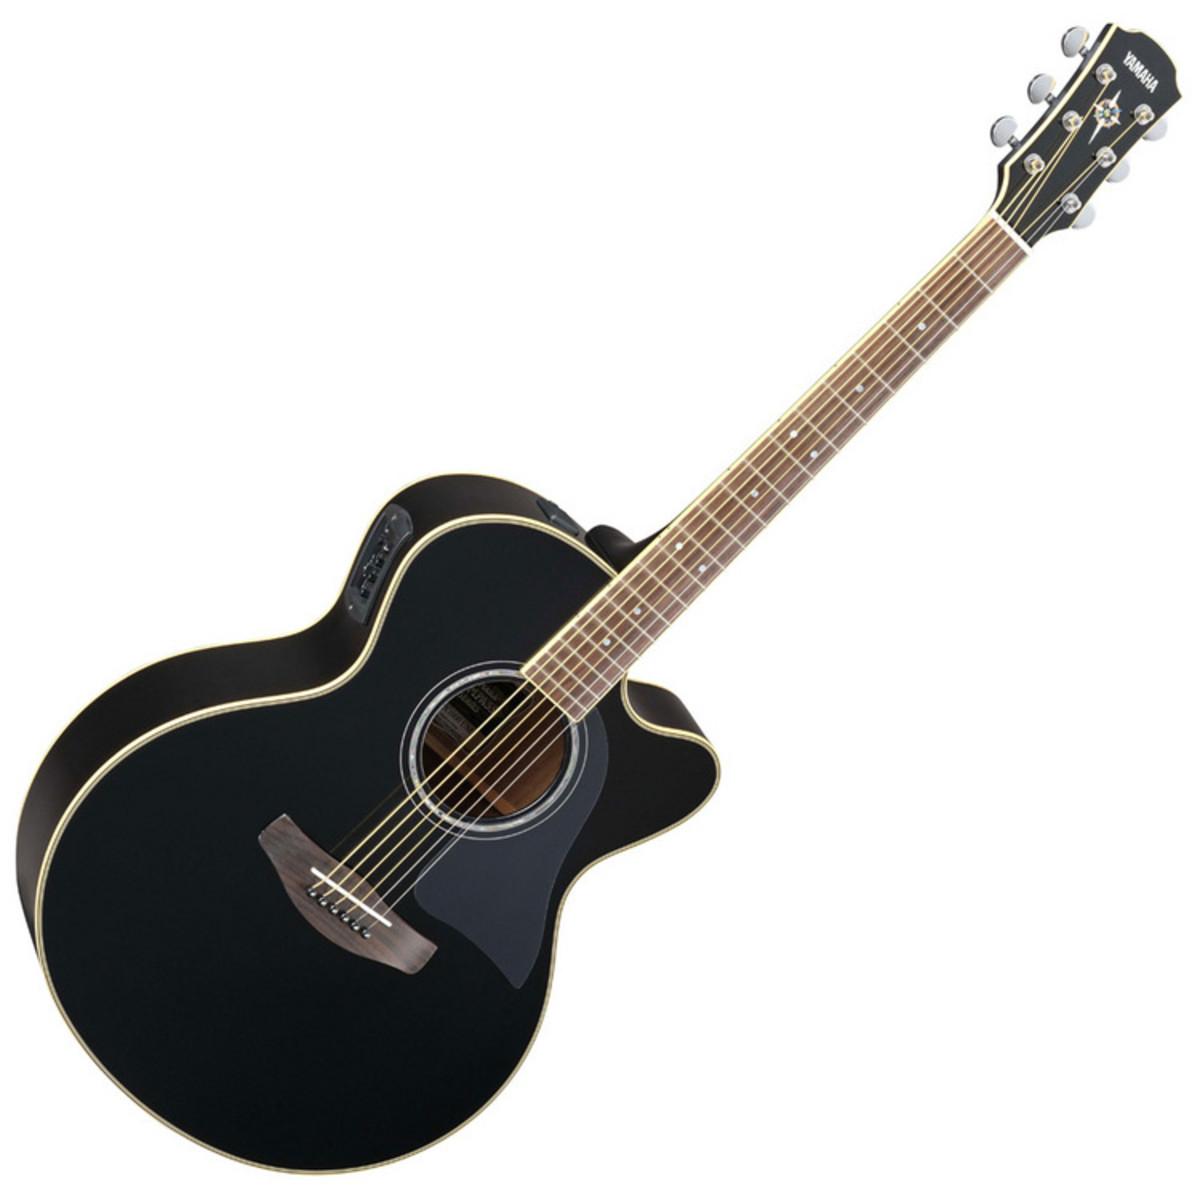 disc guitare electro acoustique yamaha cpx700ii noir. Black Bedroom Furniture Sets. Home Design Ideas